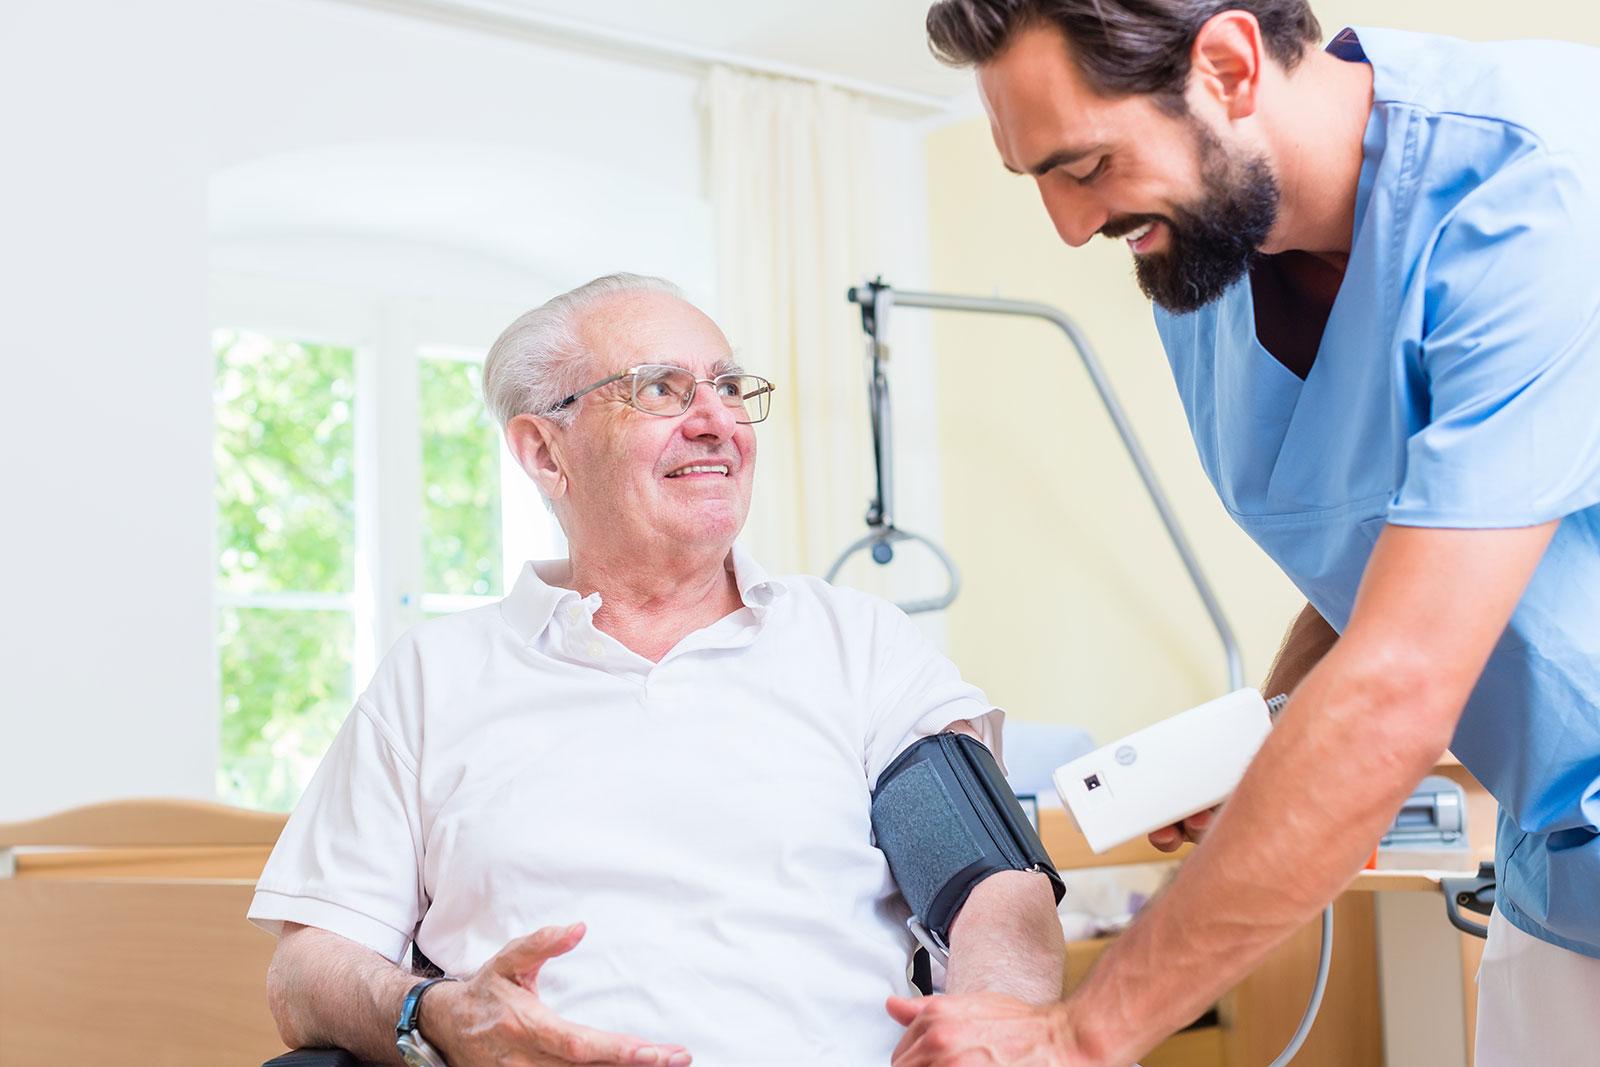 Nurse helps senior man with blood pressure measurement